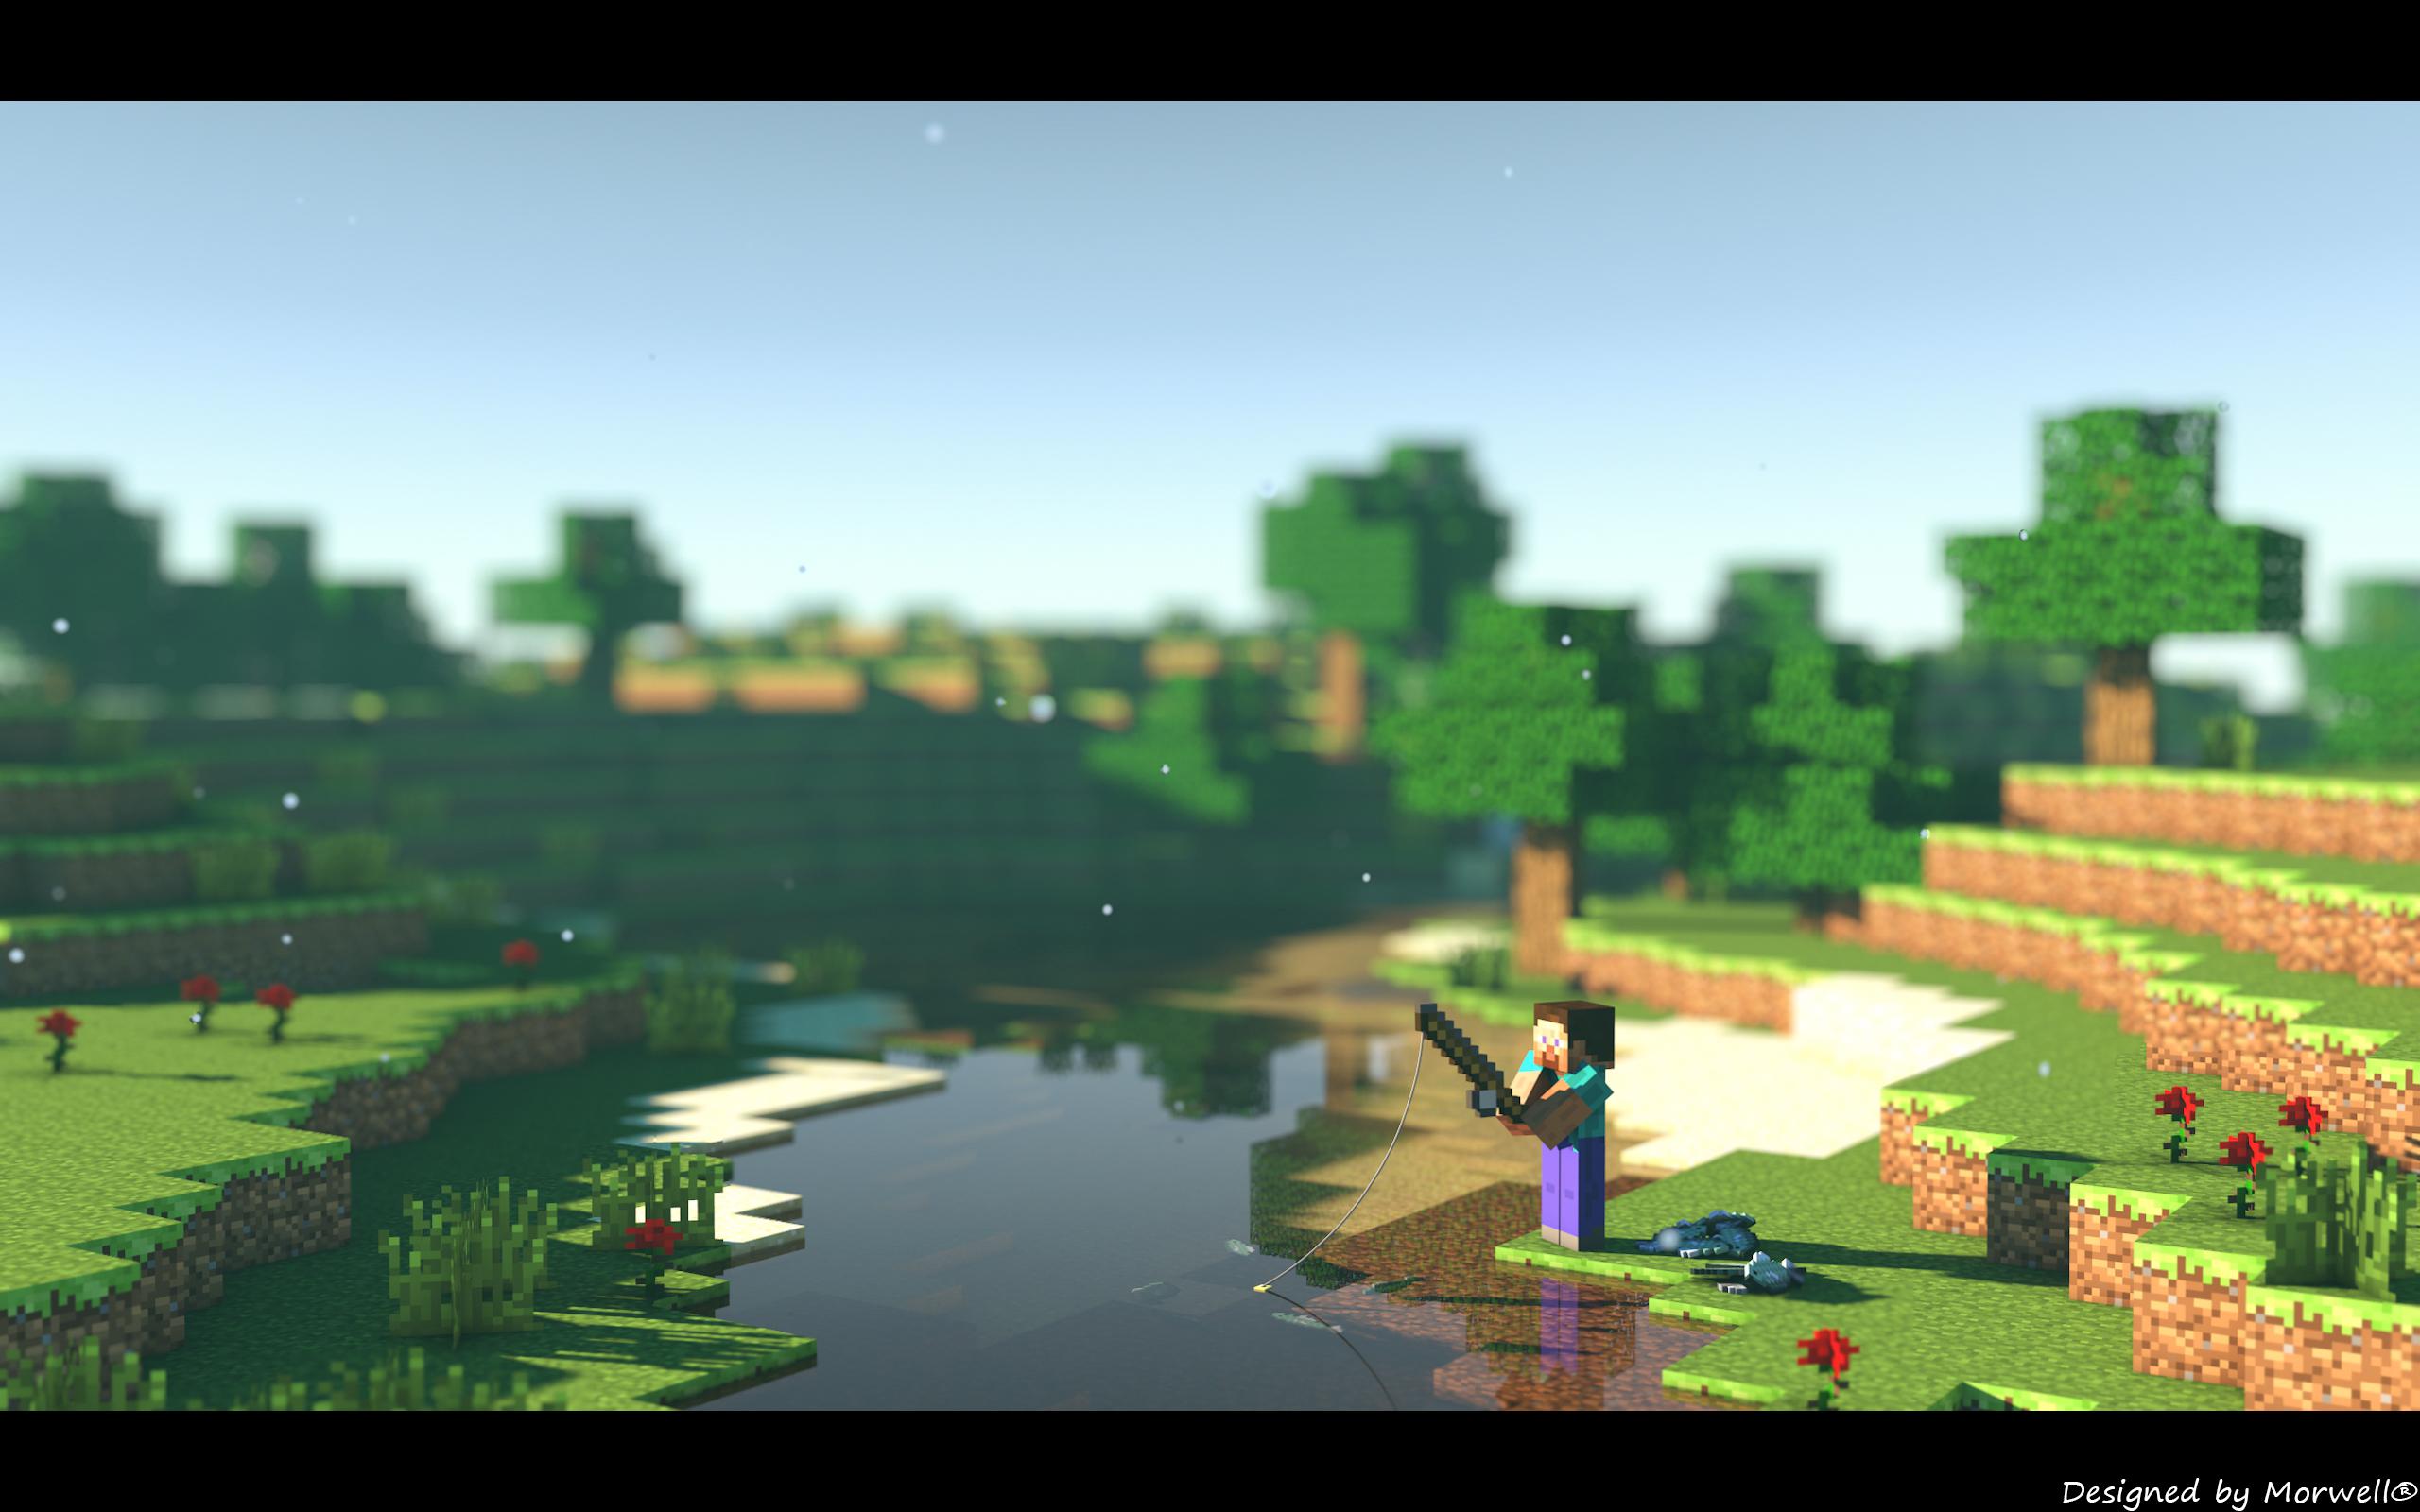 Minecraft youtube wallpaper creator wallpapersafari - Minecraft wallpaper creator online ...